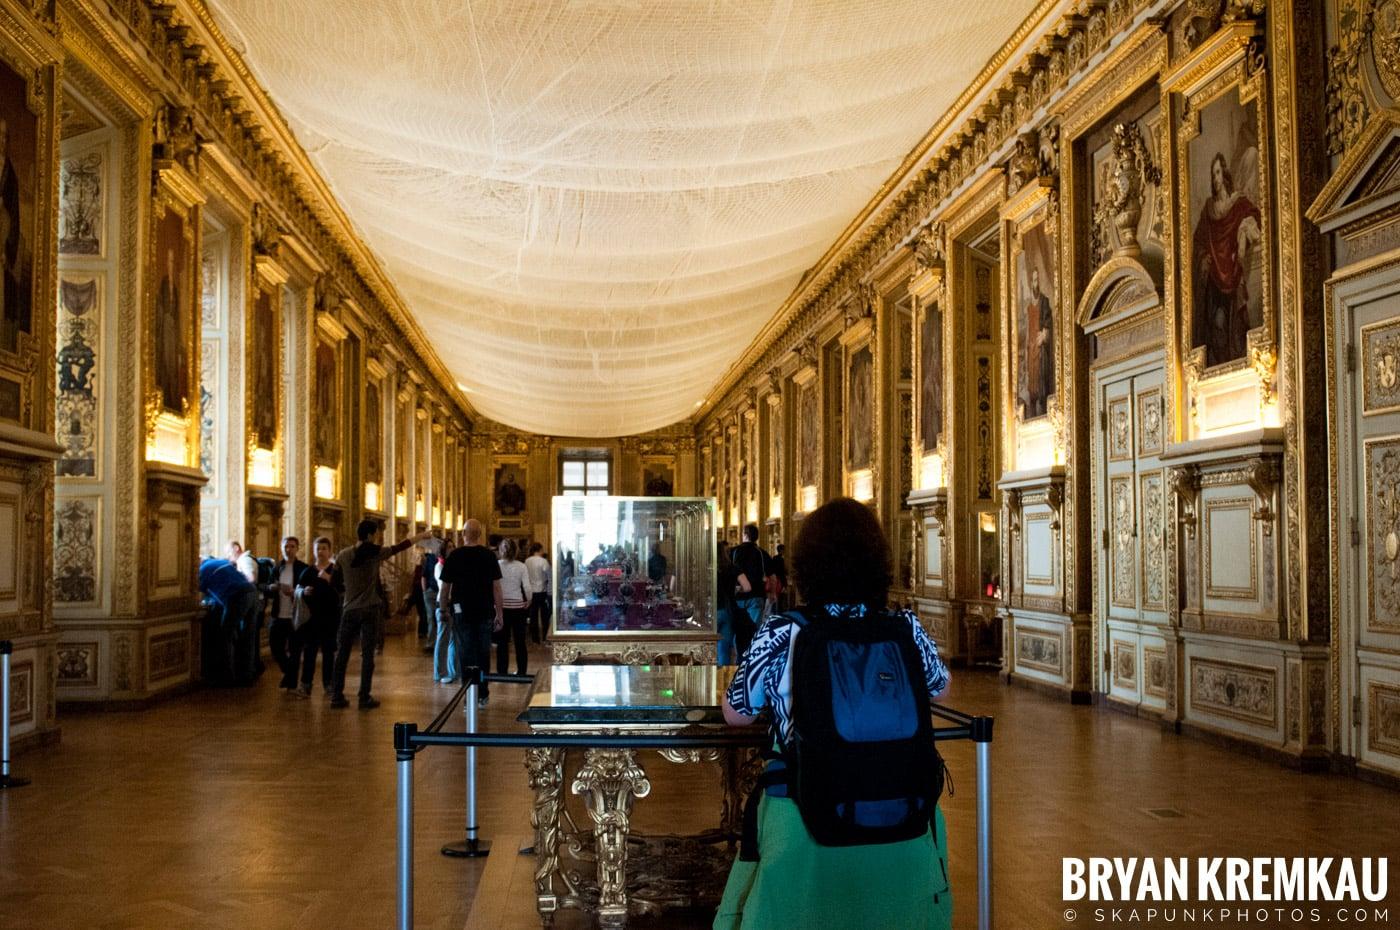 Paris, France Honeymoon - Day 3 - 7.20.11 (51)